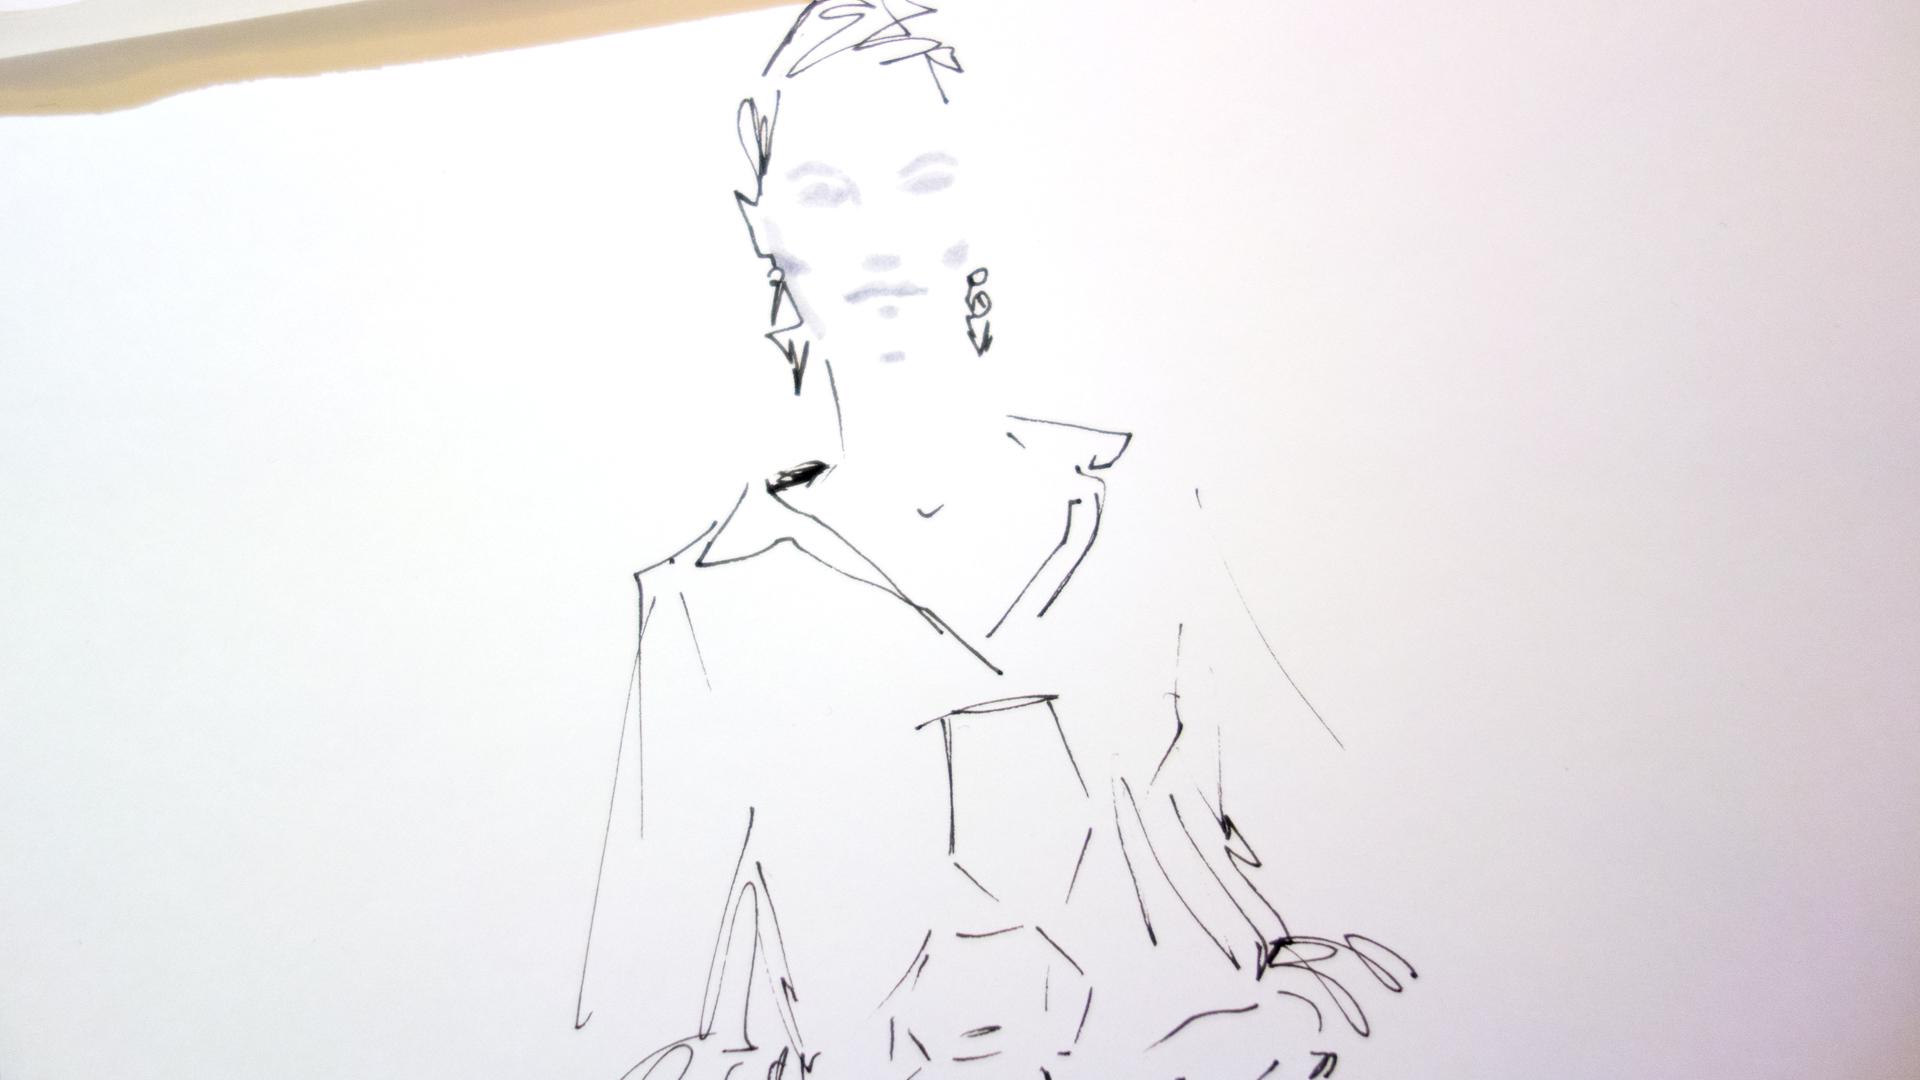 Live-Sketching-Fashion-Illustration-Event-Lillet-Virginia-Romo-2.jpg